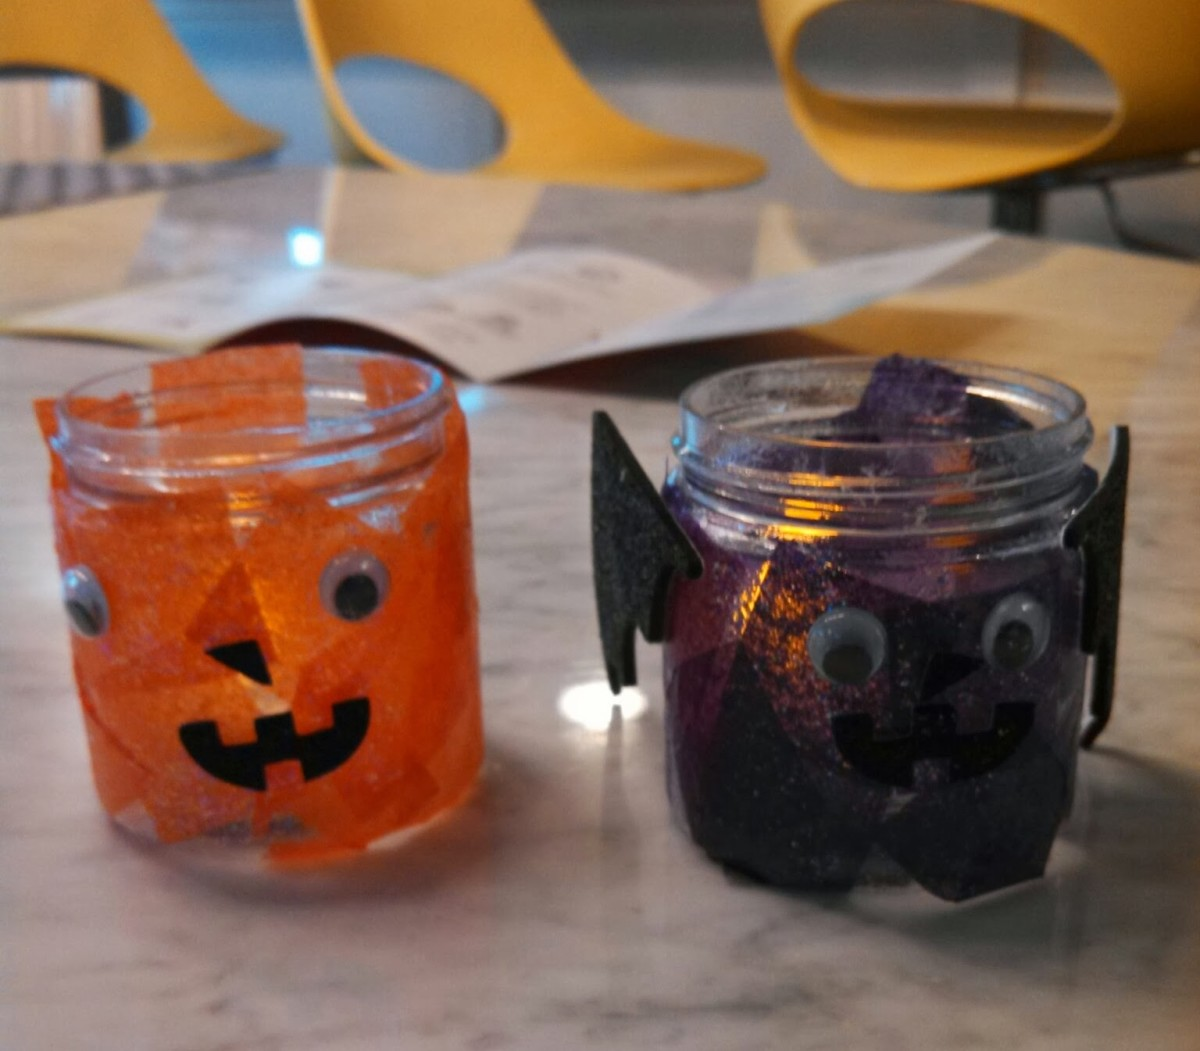 kiwi crate, kids fun, crafts for kids, DIY Halloween